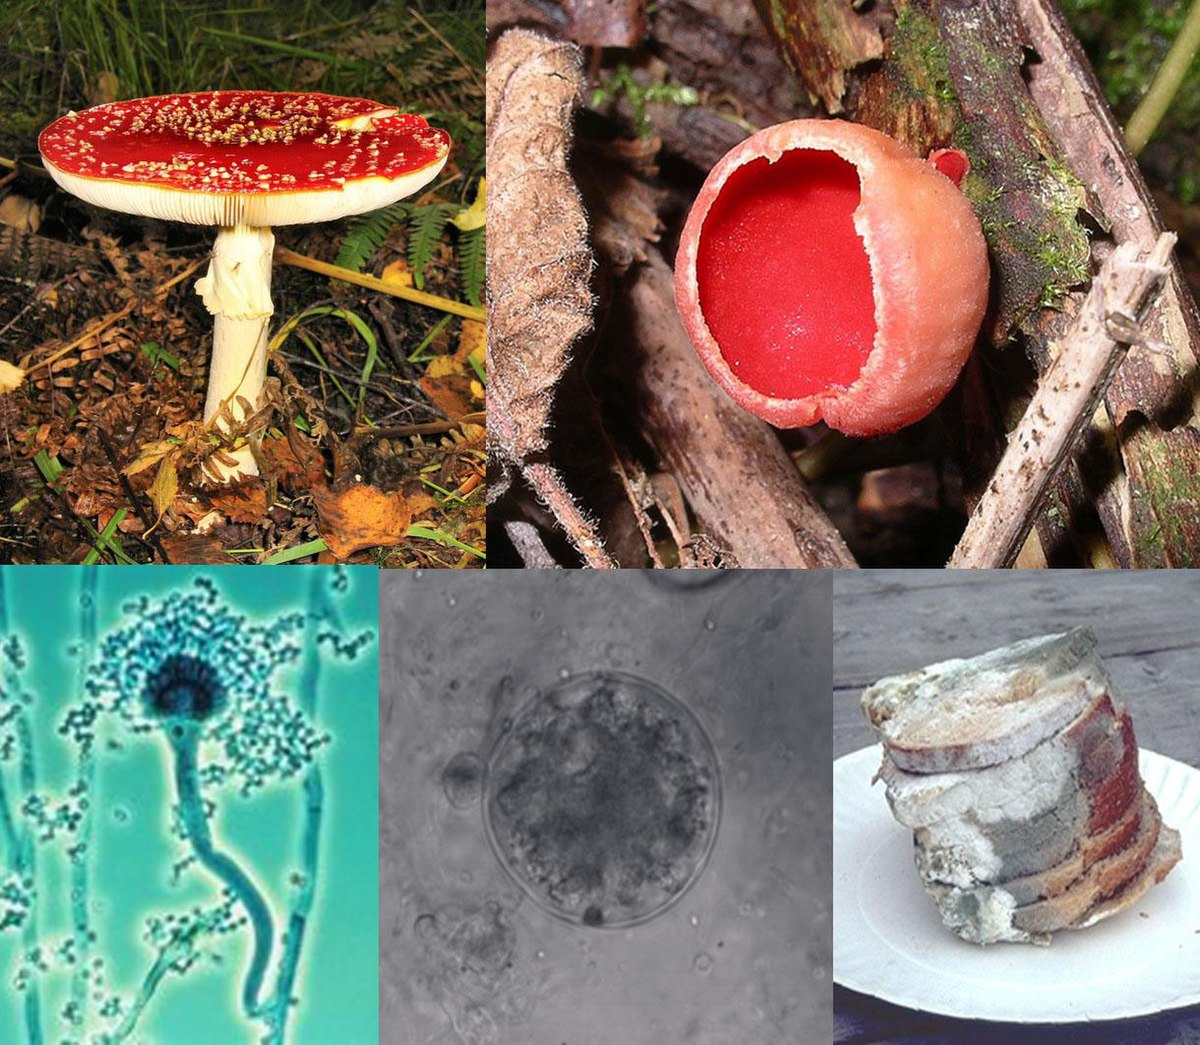 zygomycete gombák 10 hónapos giardia la bebélusi